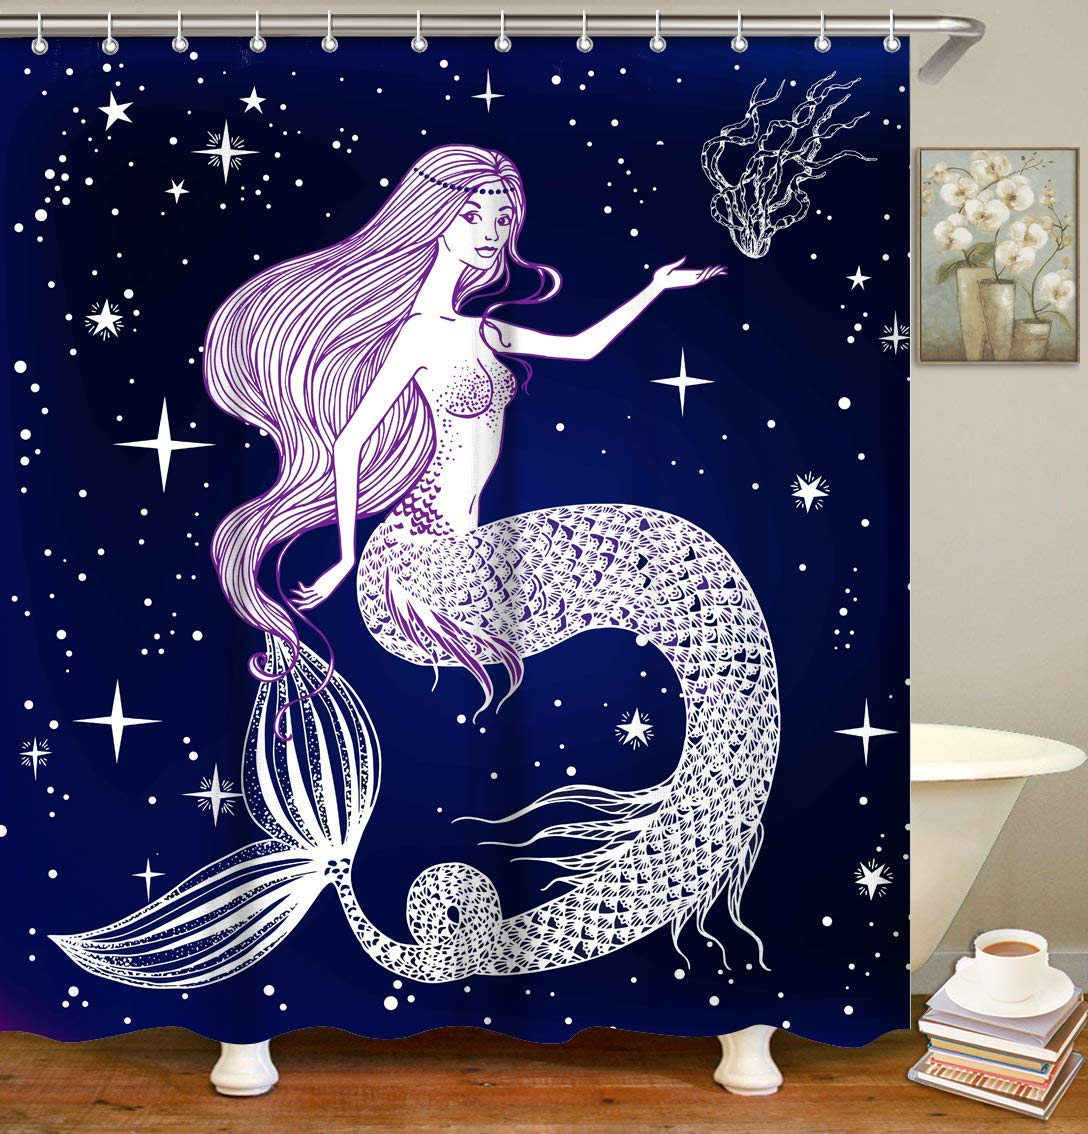 Mermaid Shower Curtain Set With 12 Hooks Fabric Bath Curtain Decorative Bathroom Accessories Home Decoration Purple Shower Curtains Aliexpress